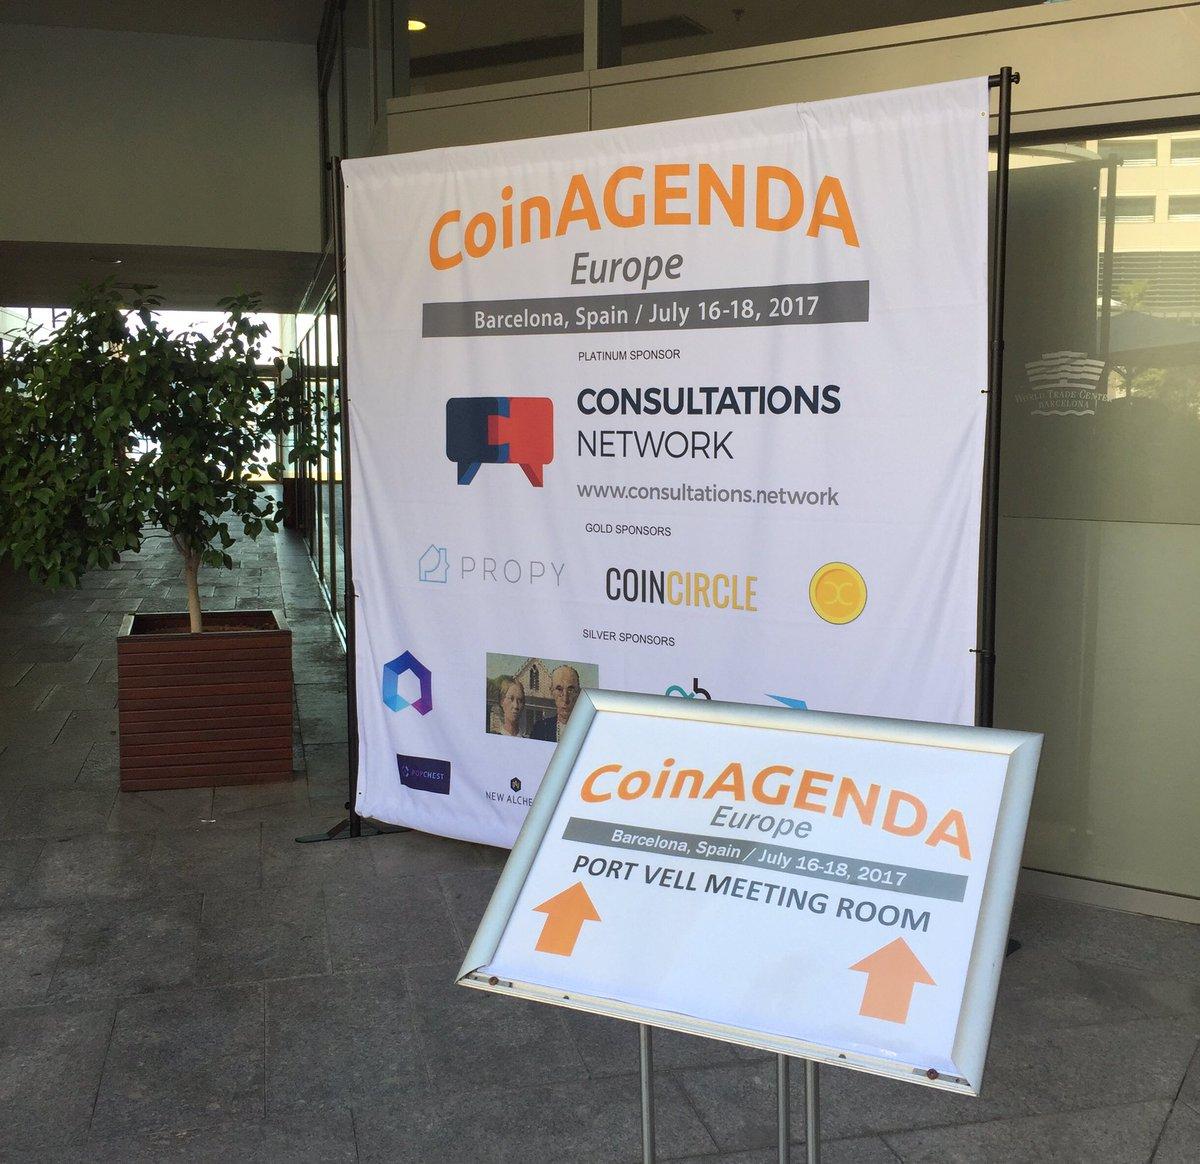 Talk to us at @CoinAgenda #Barcelona. <br>http://pic.twitter.com/IiOdUQeoks